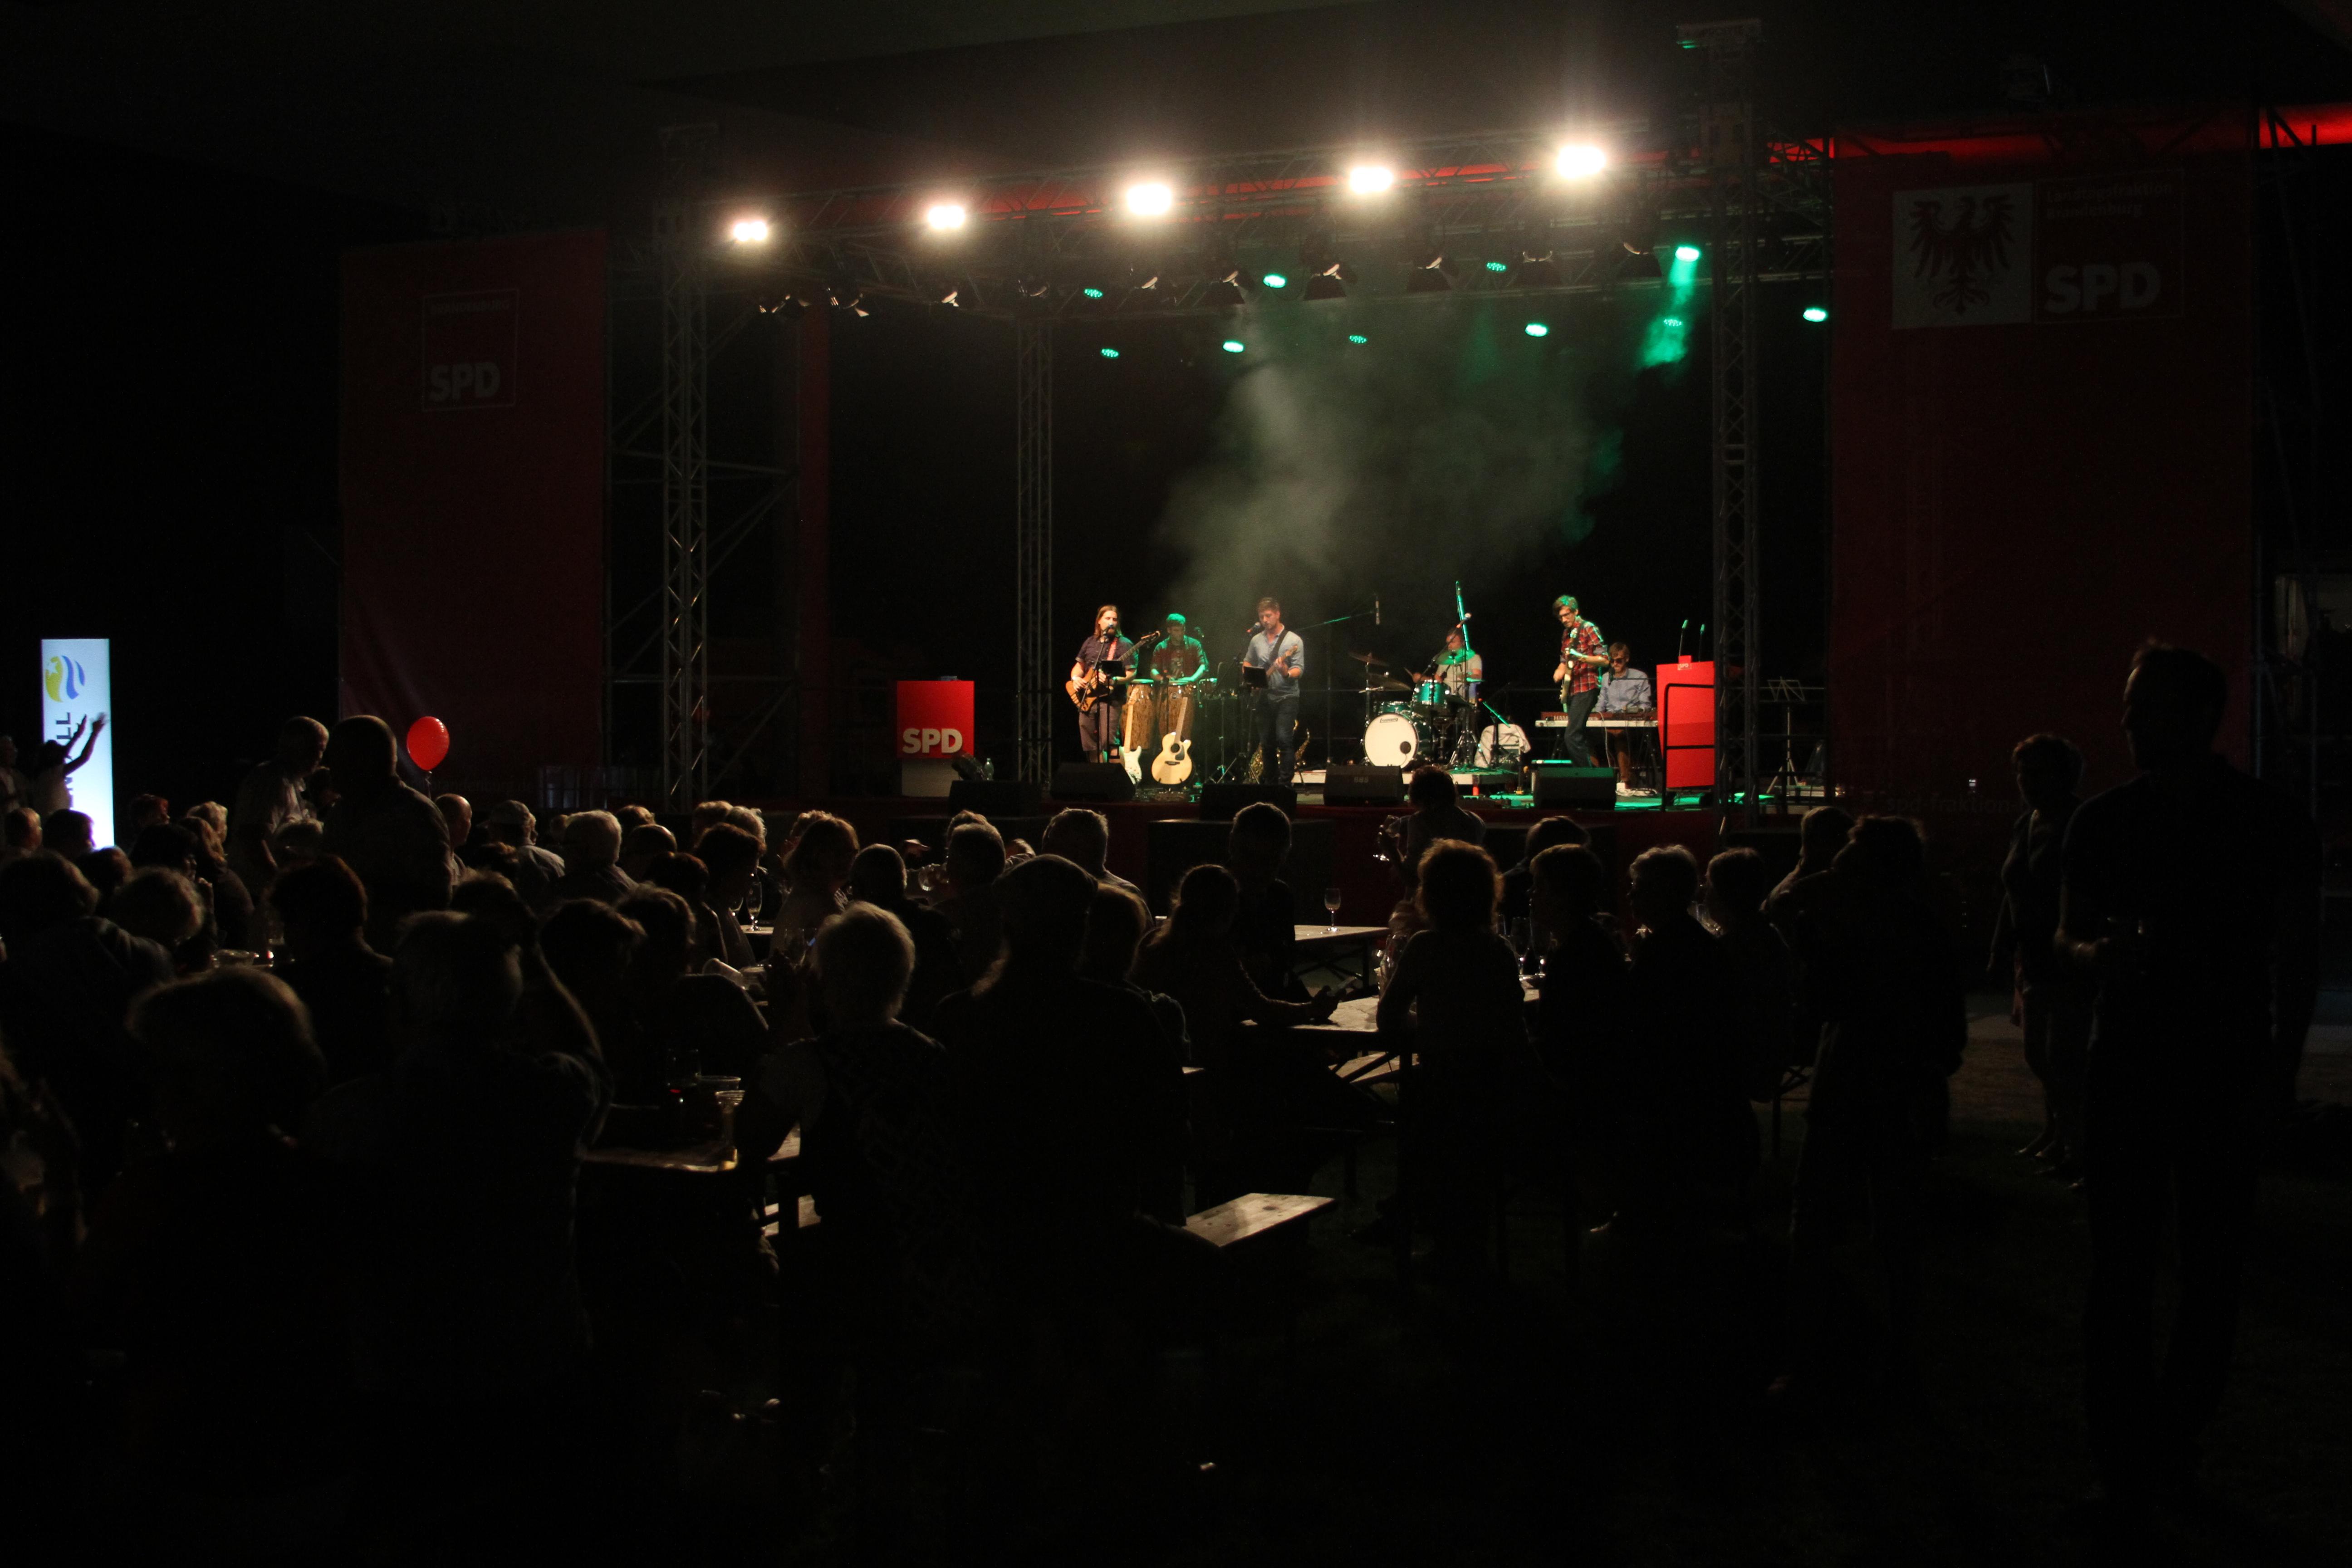 09. September 2016, Potsdam